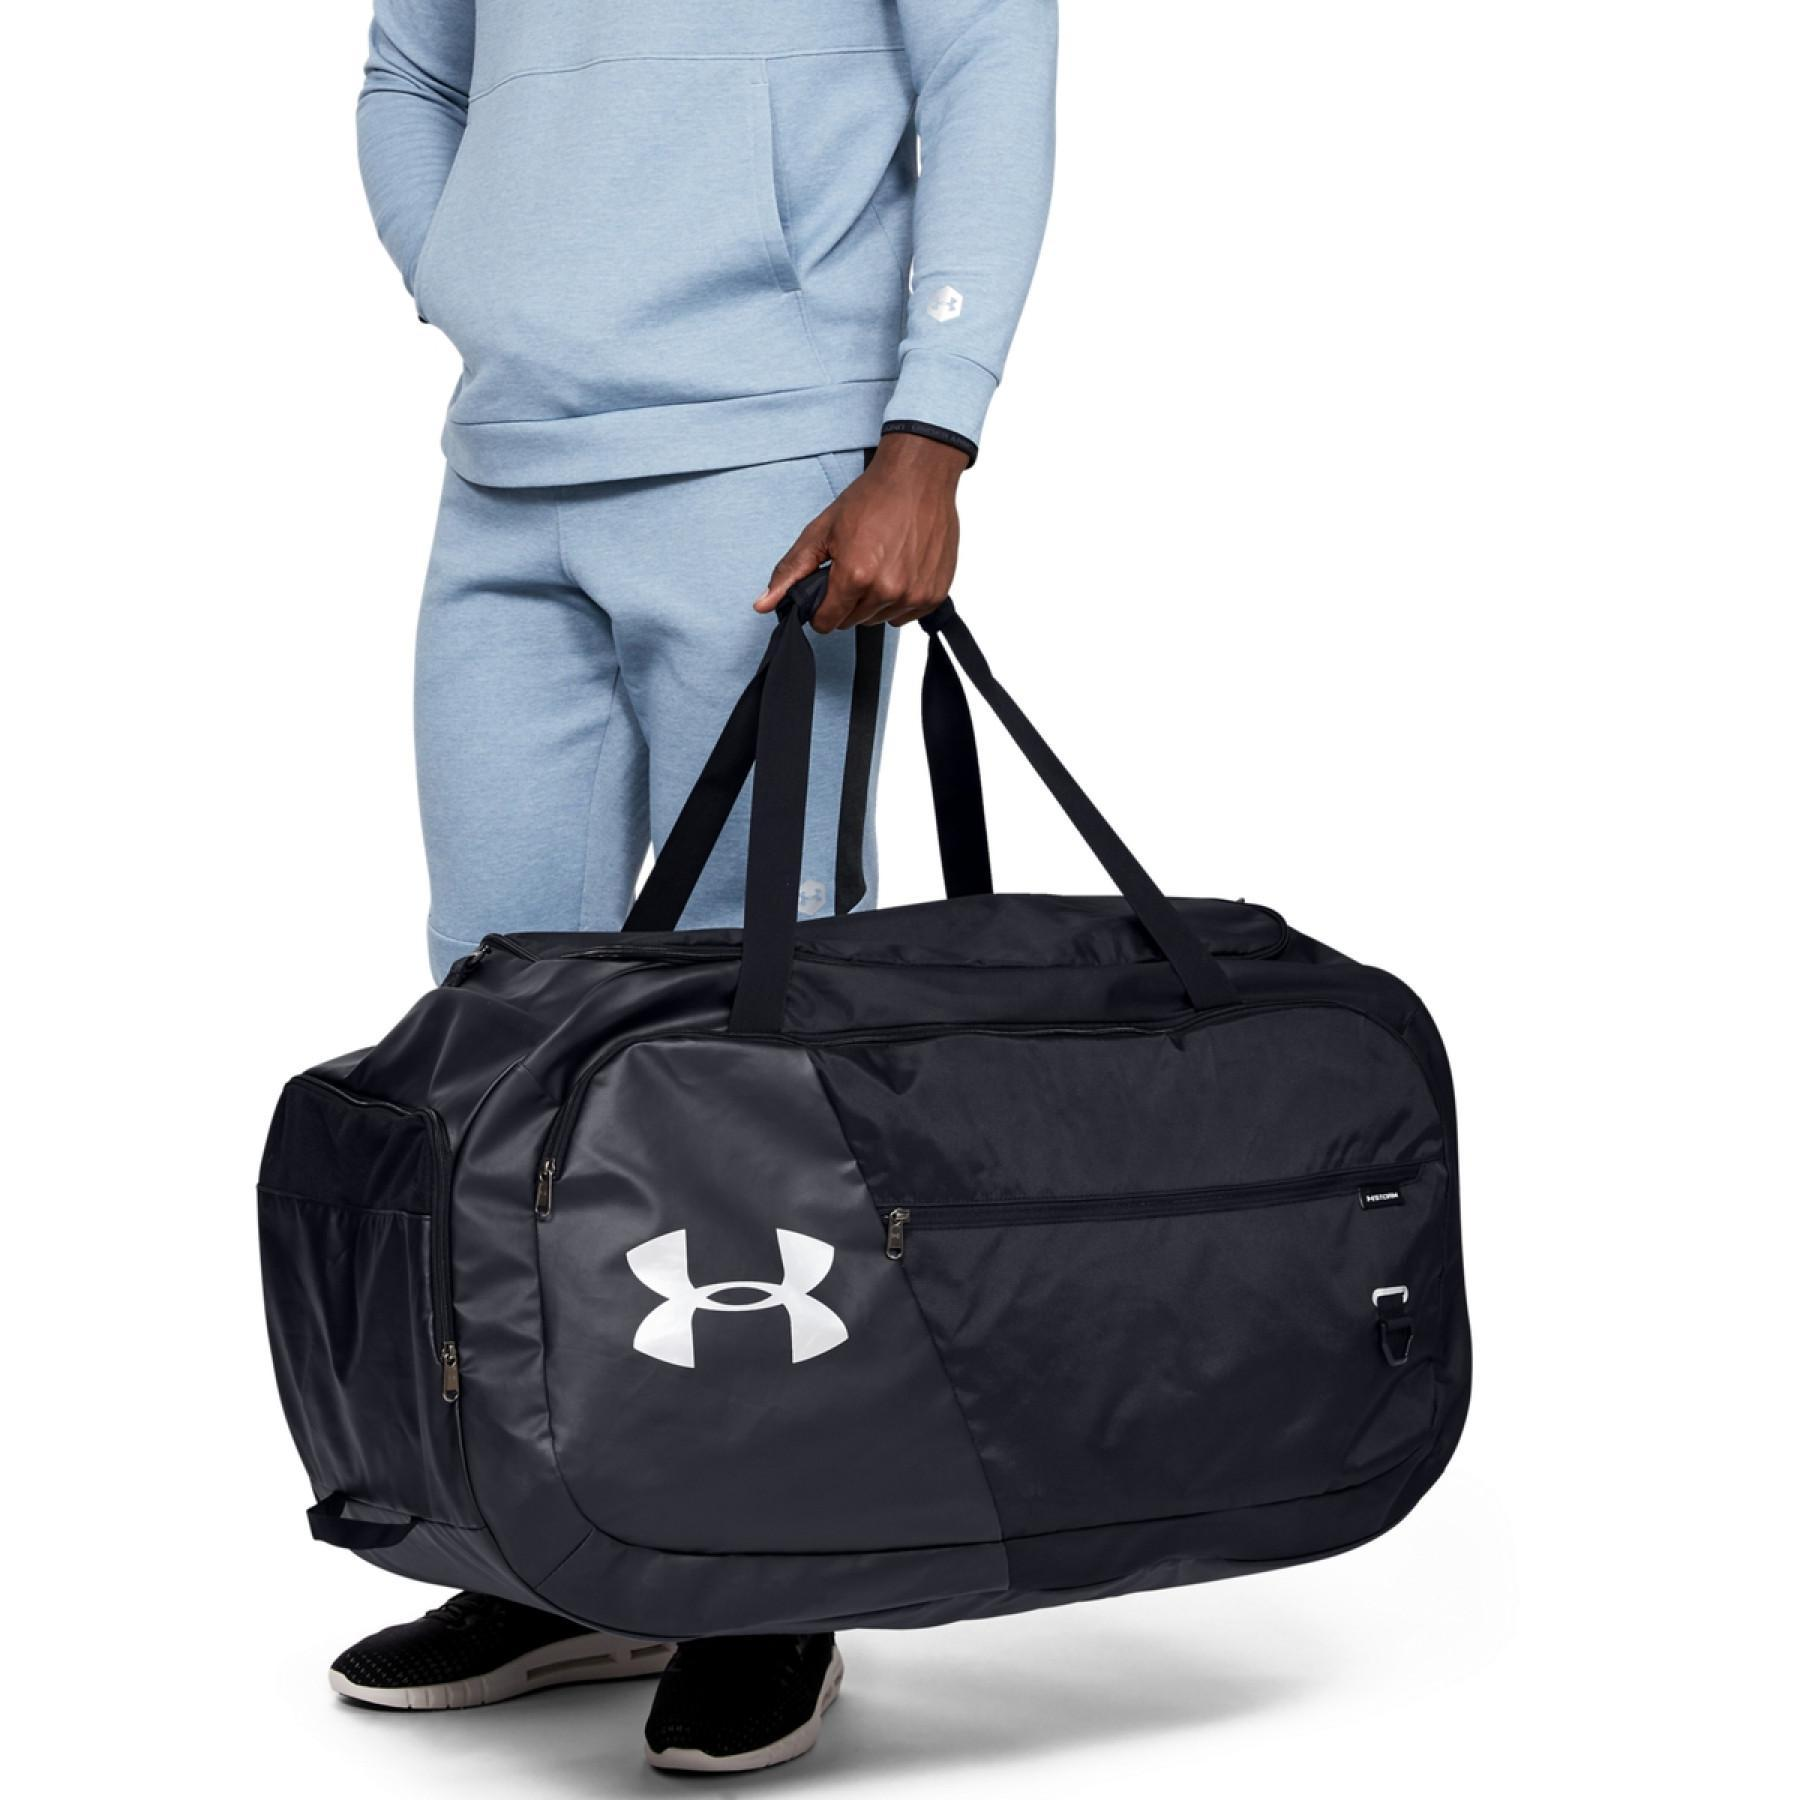 Sports bag Under Armour Undeniable 4.0 XL